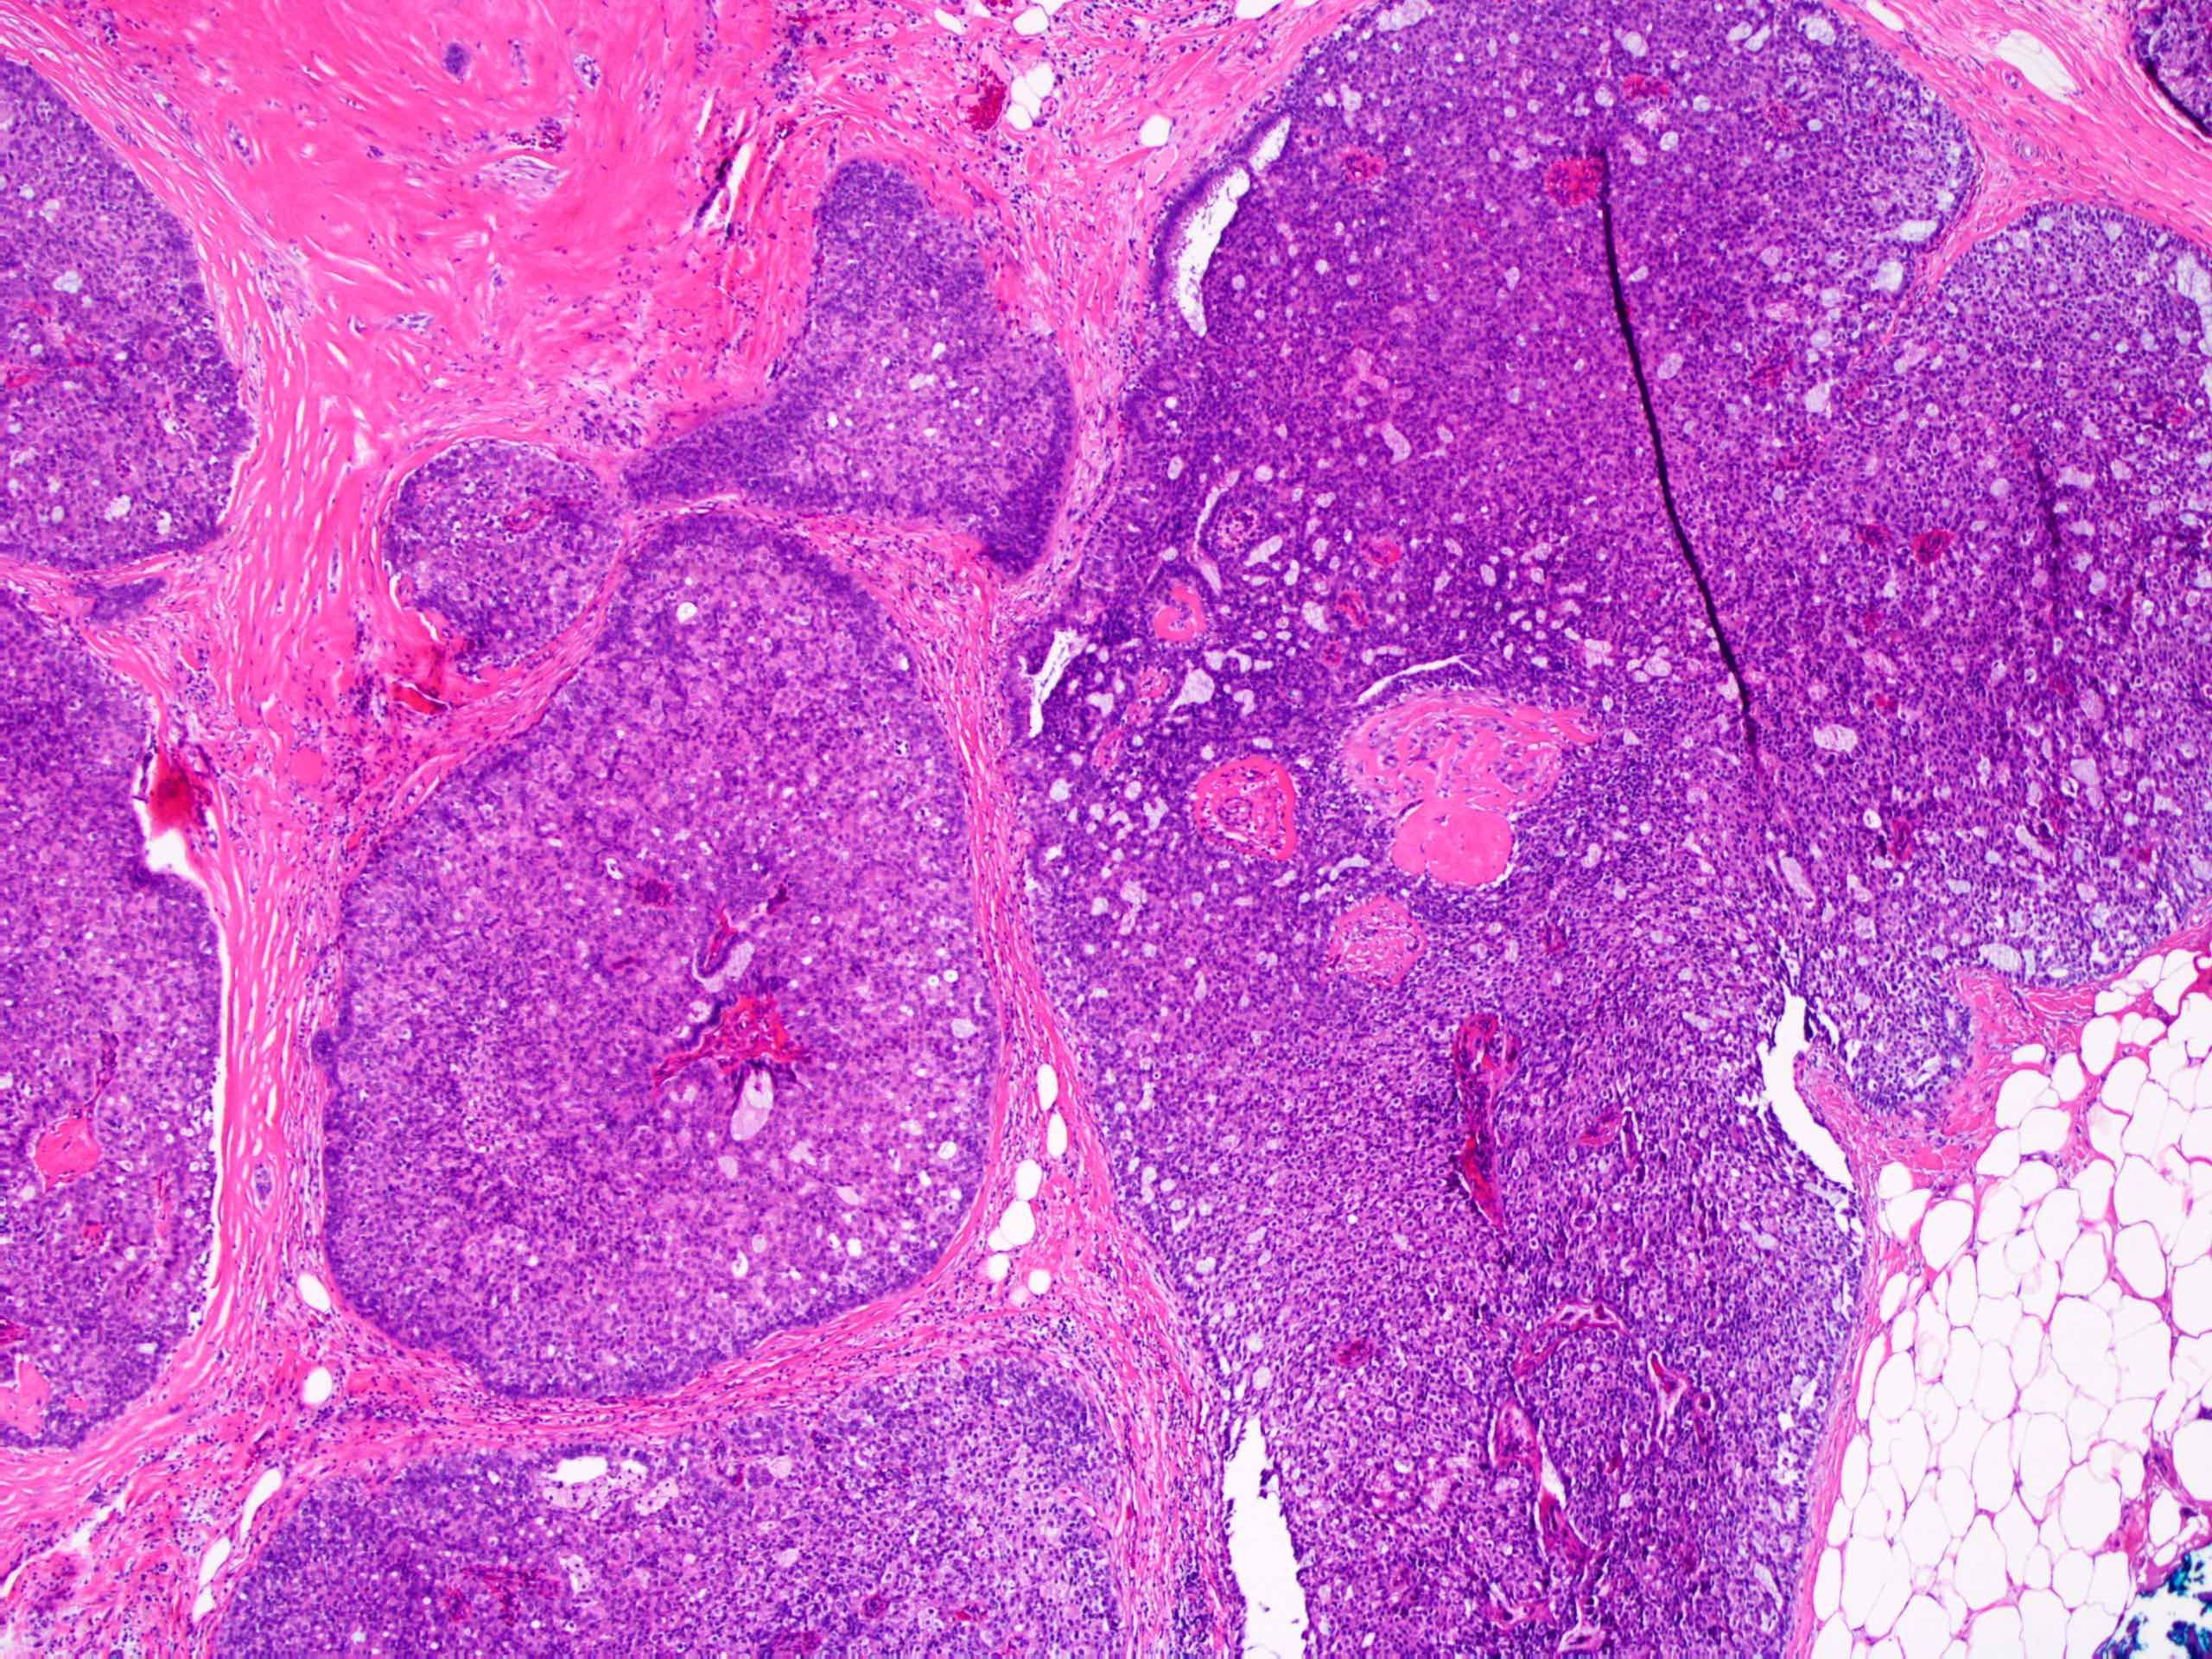 intraductalis papilloma ductalis hyperplasiaval hpv rák nyirokcsomók